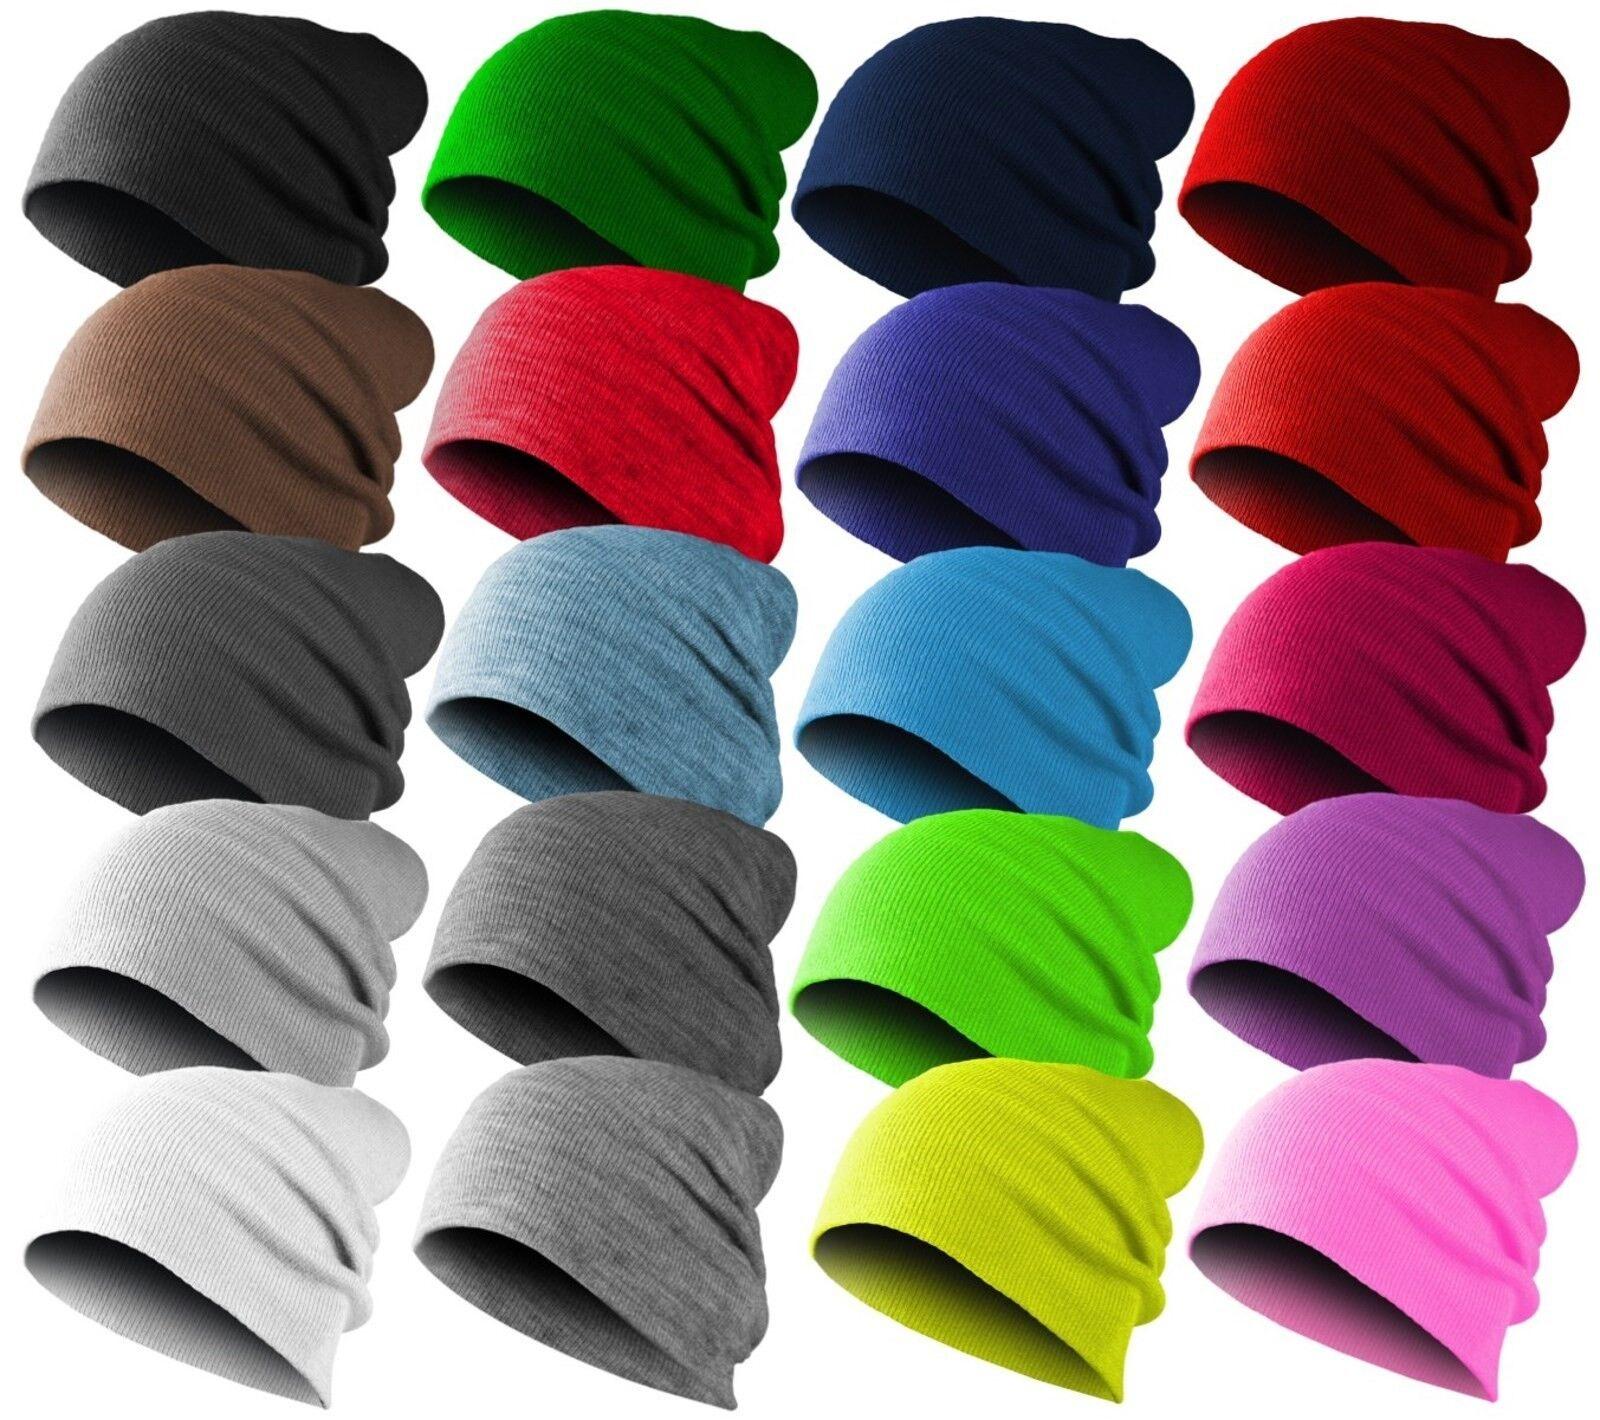 f0d9f02e2a4 Mstrds Beanie Basic Flap MasterDis Hat Amp Royal